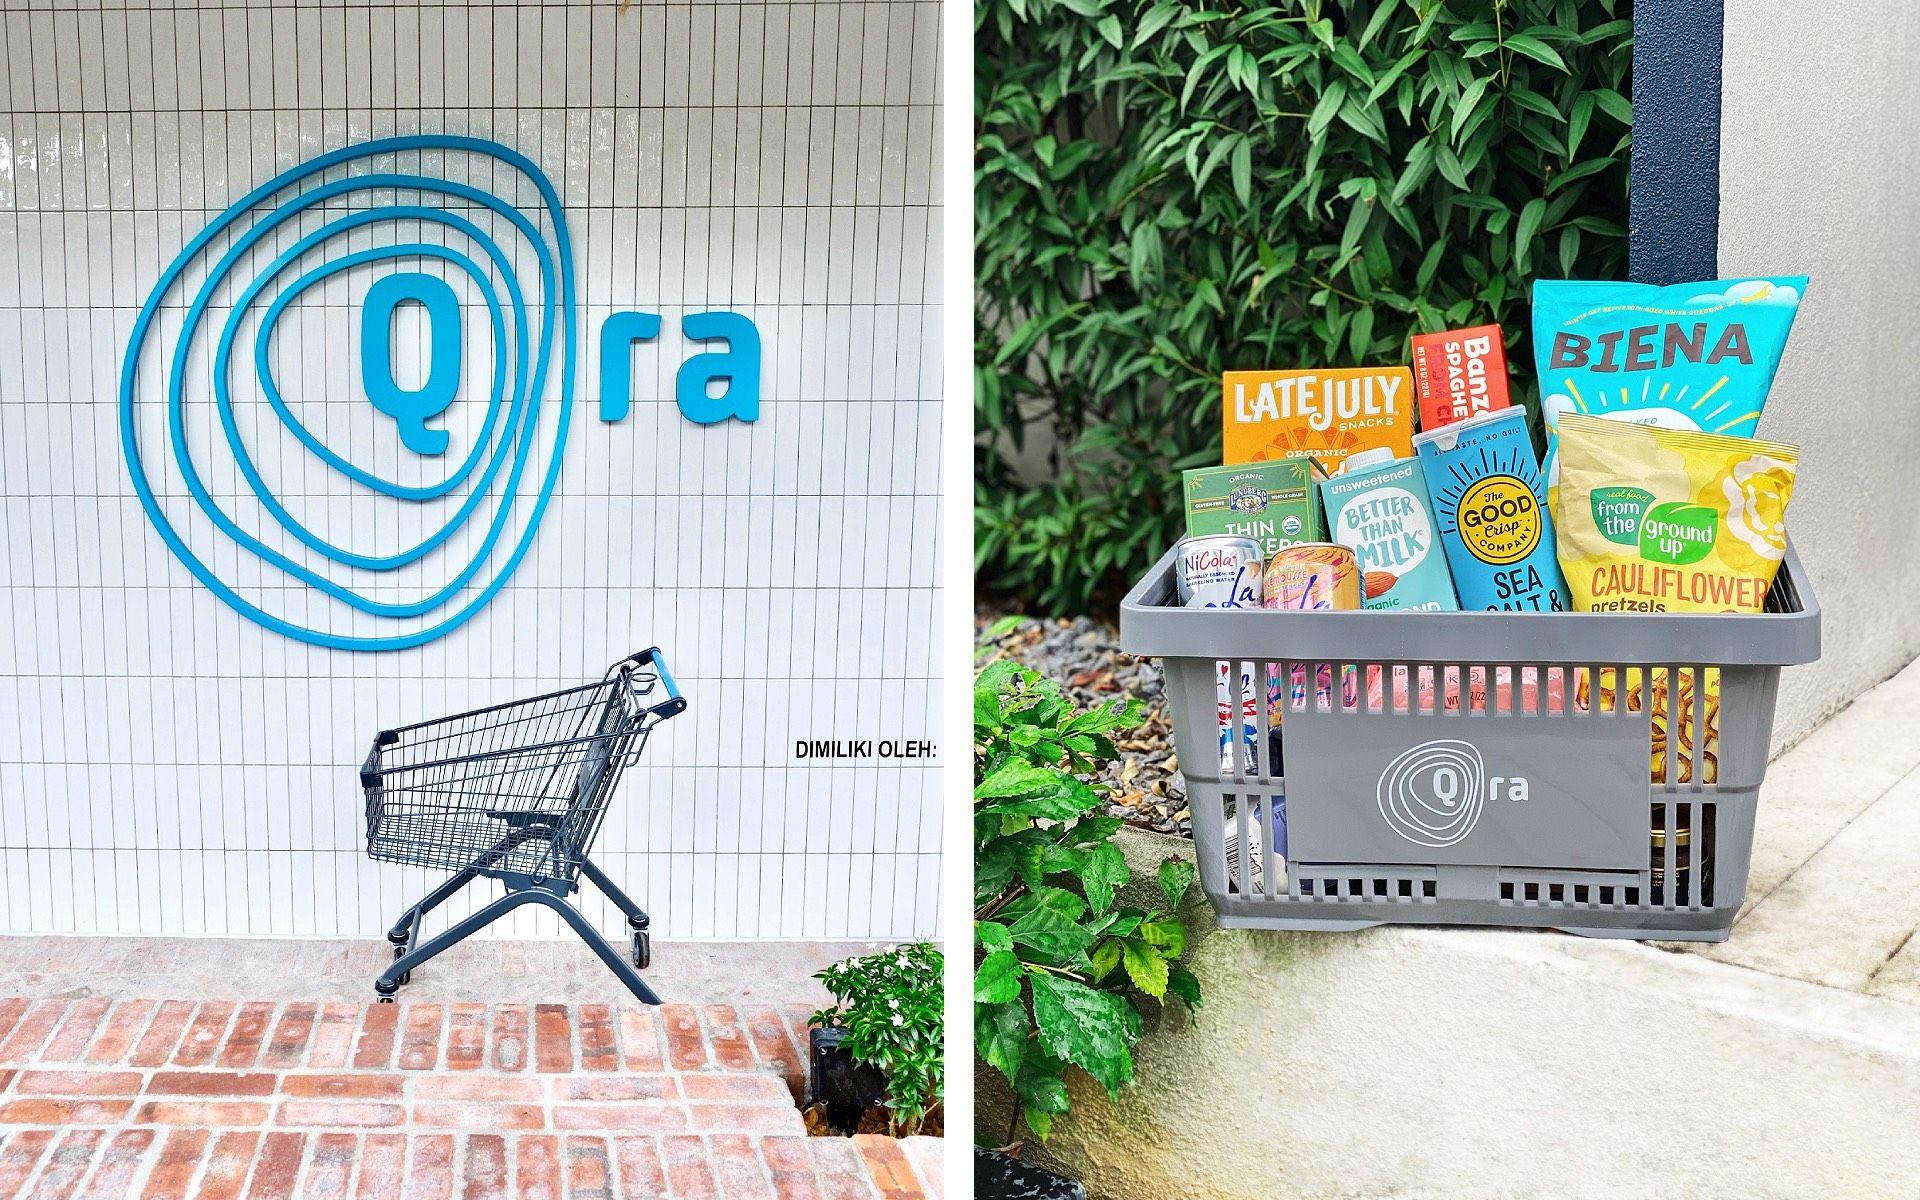 6 Reasons We Love Qra, A New Premium Supermarket In Bukit Tunku